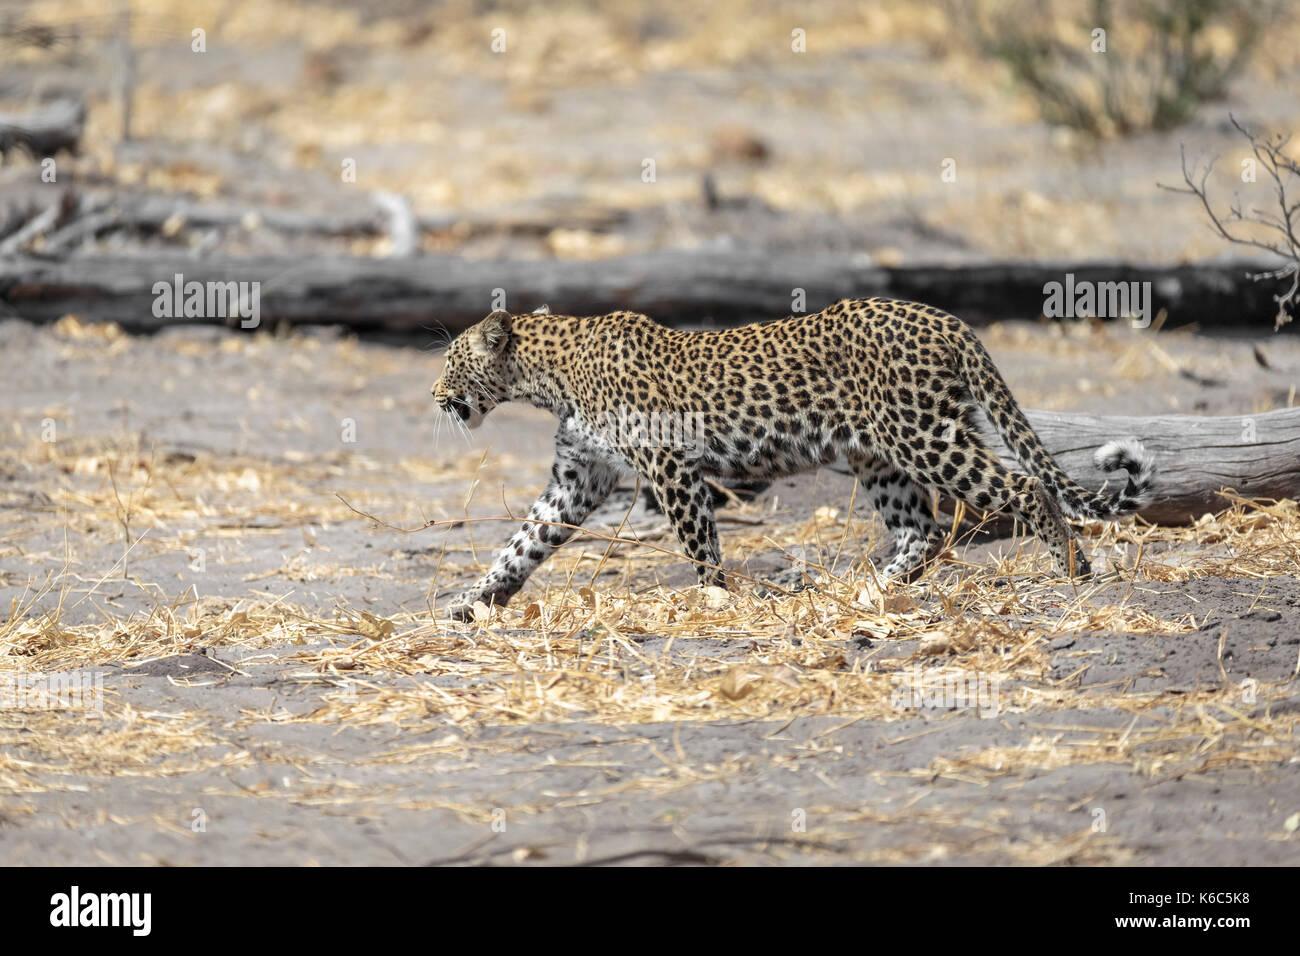 Leopard on the move, Kwai, Okavango delta, botswana - Stock Image